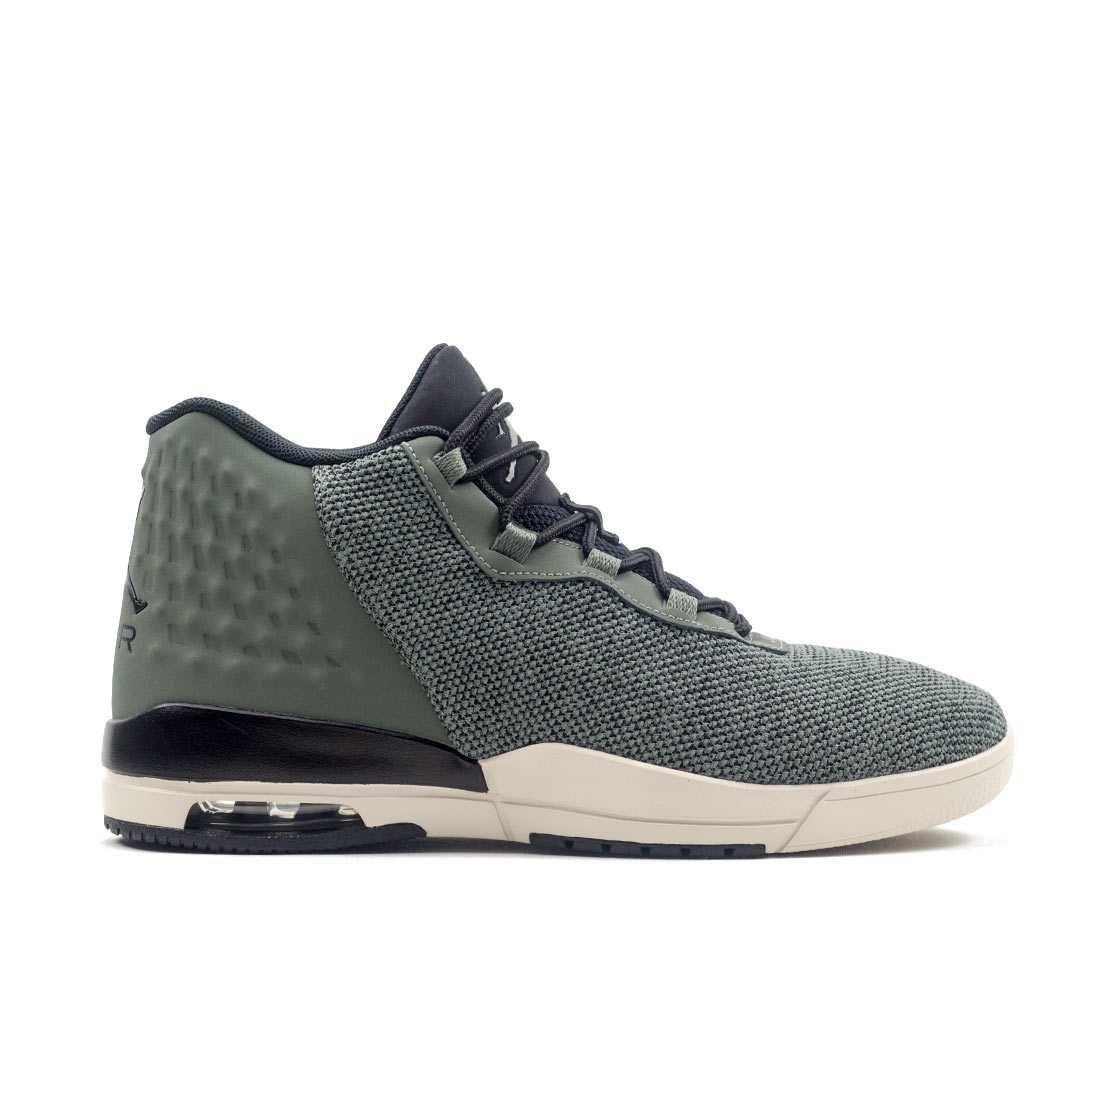 Jordan Schuhe – Academy grau schwarz weiß Größe  40 40 40 3fce20